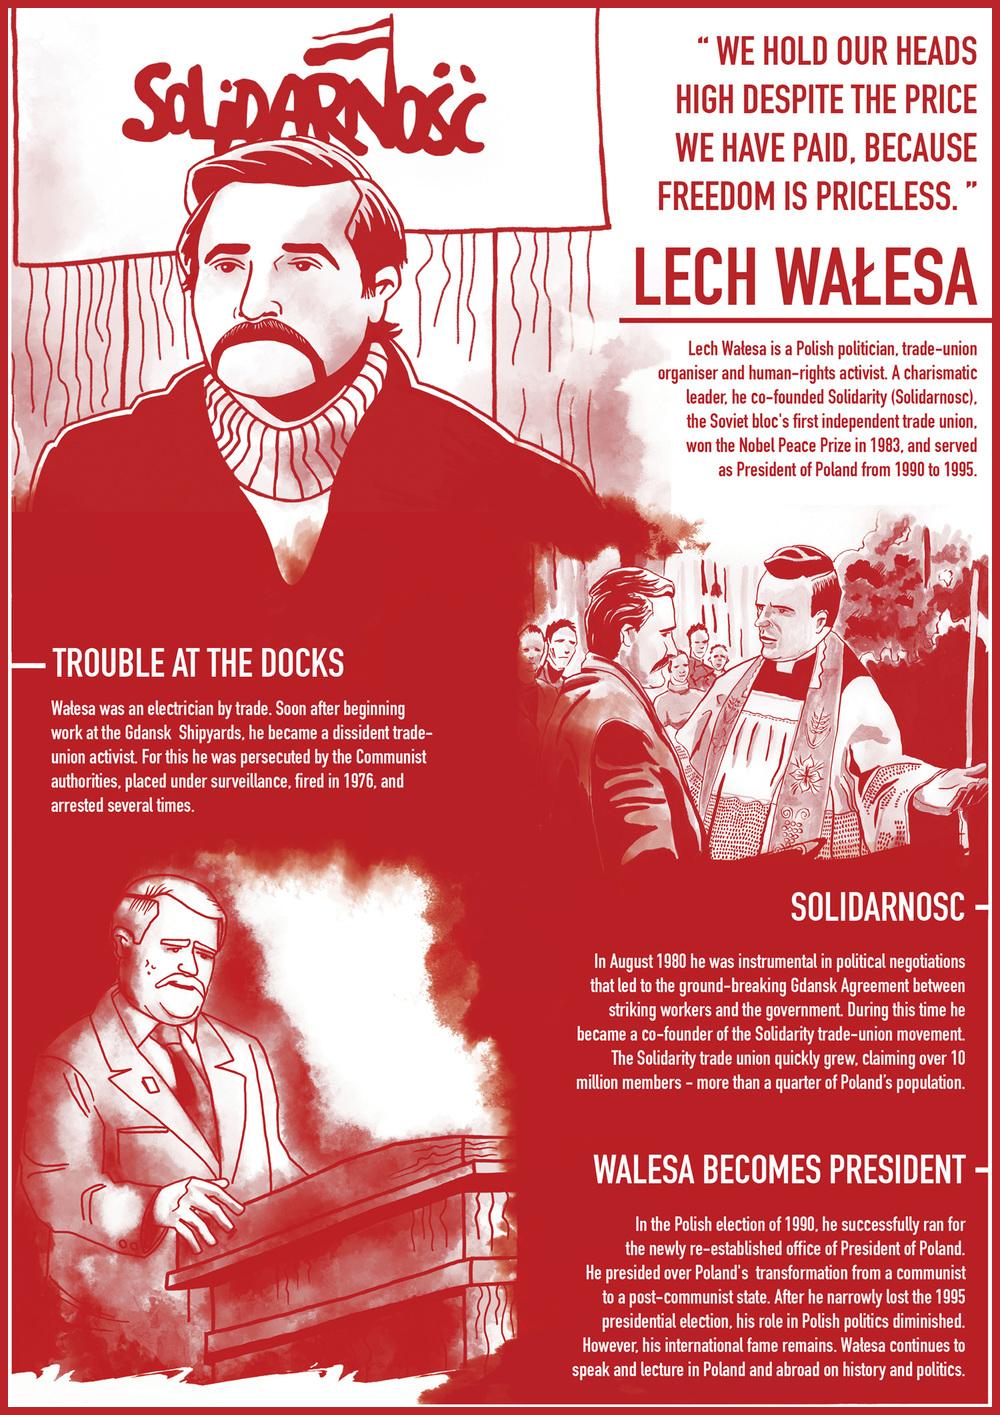 History_LechWalesa72.jpg